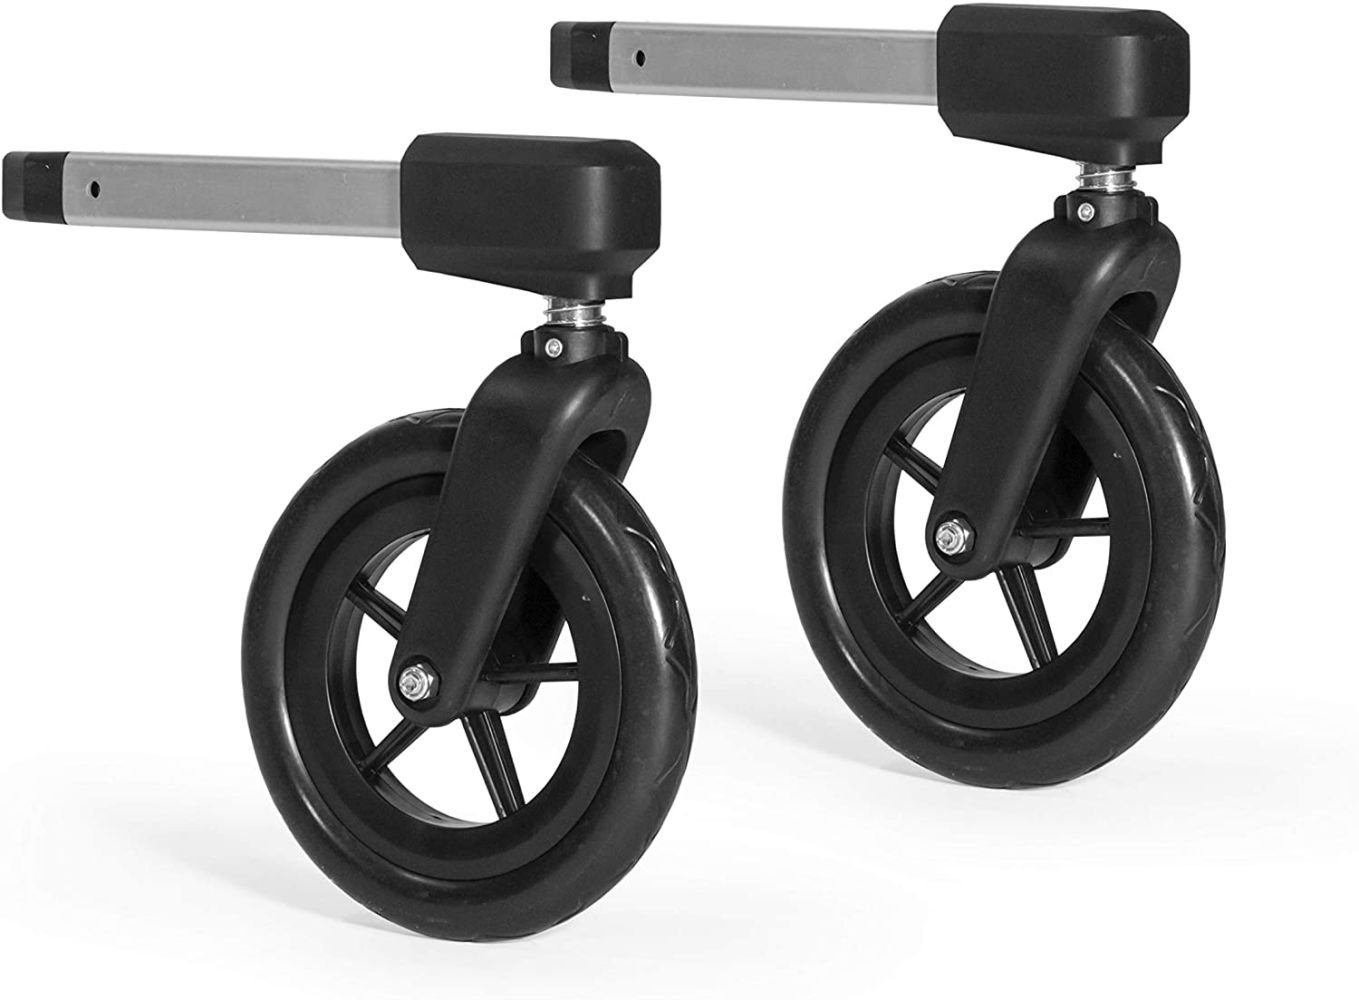 Burley Two-Wheel Stroller Kit-3091980201 Silber One Size Bild 1